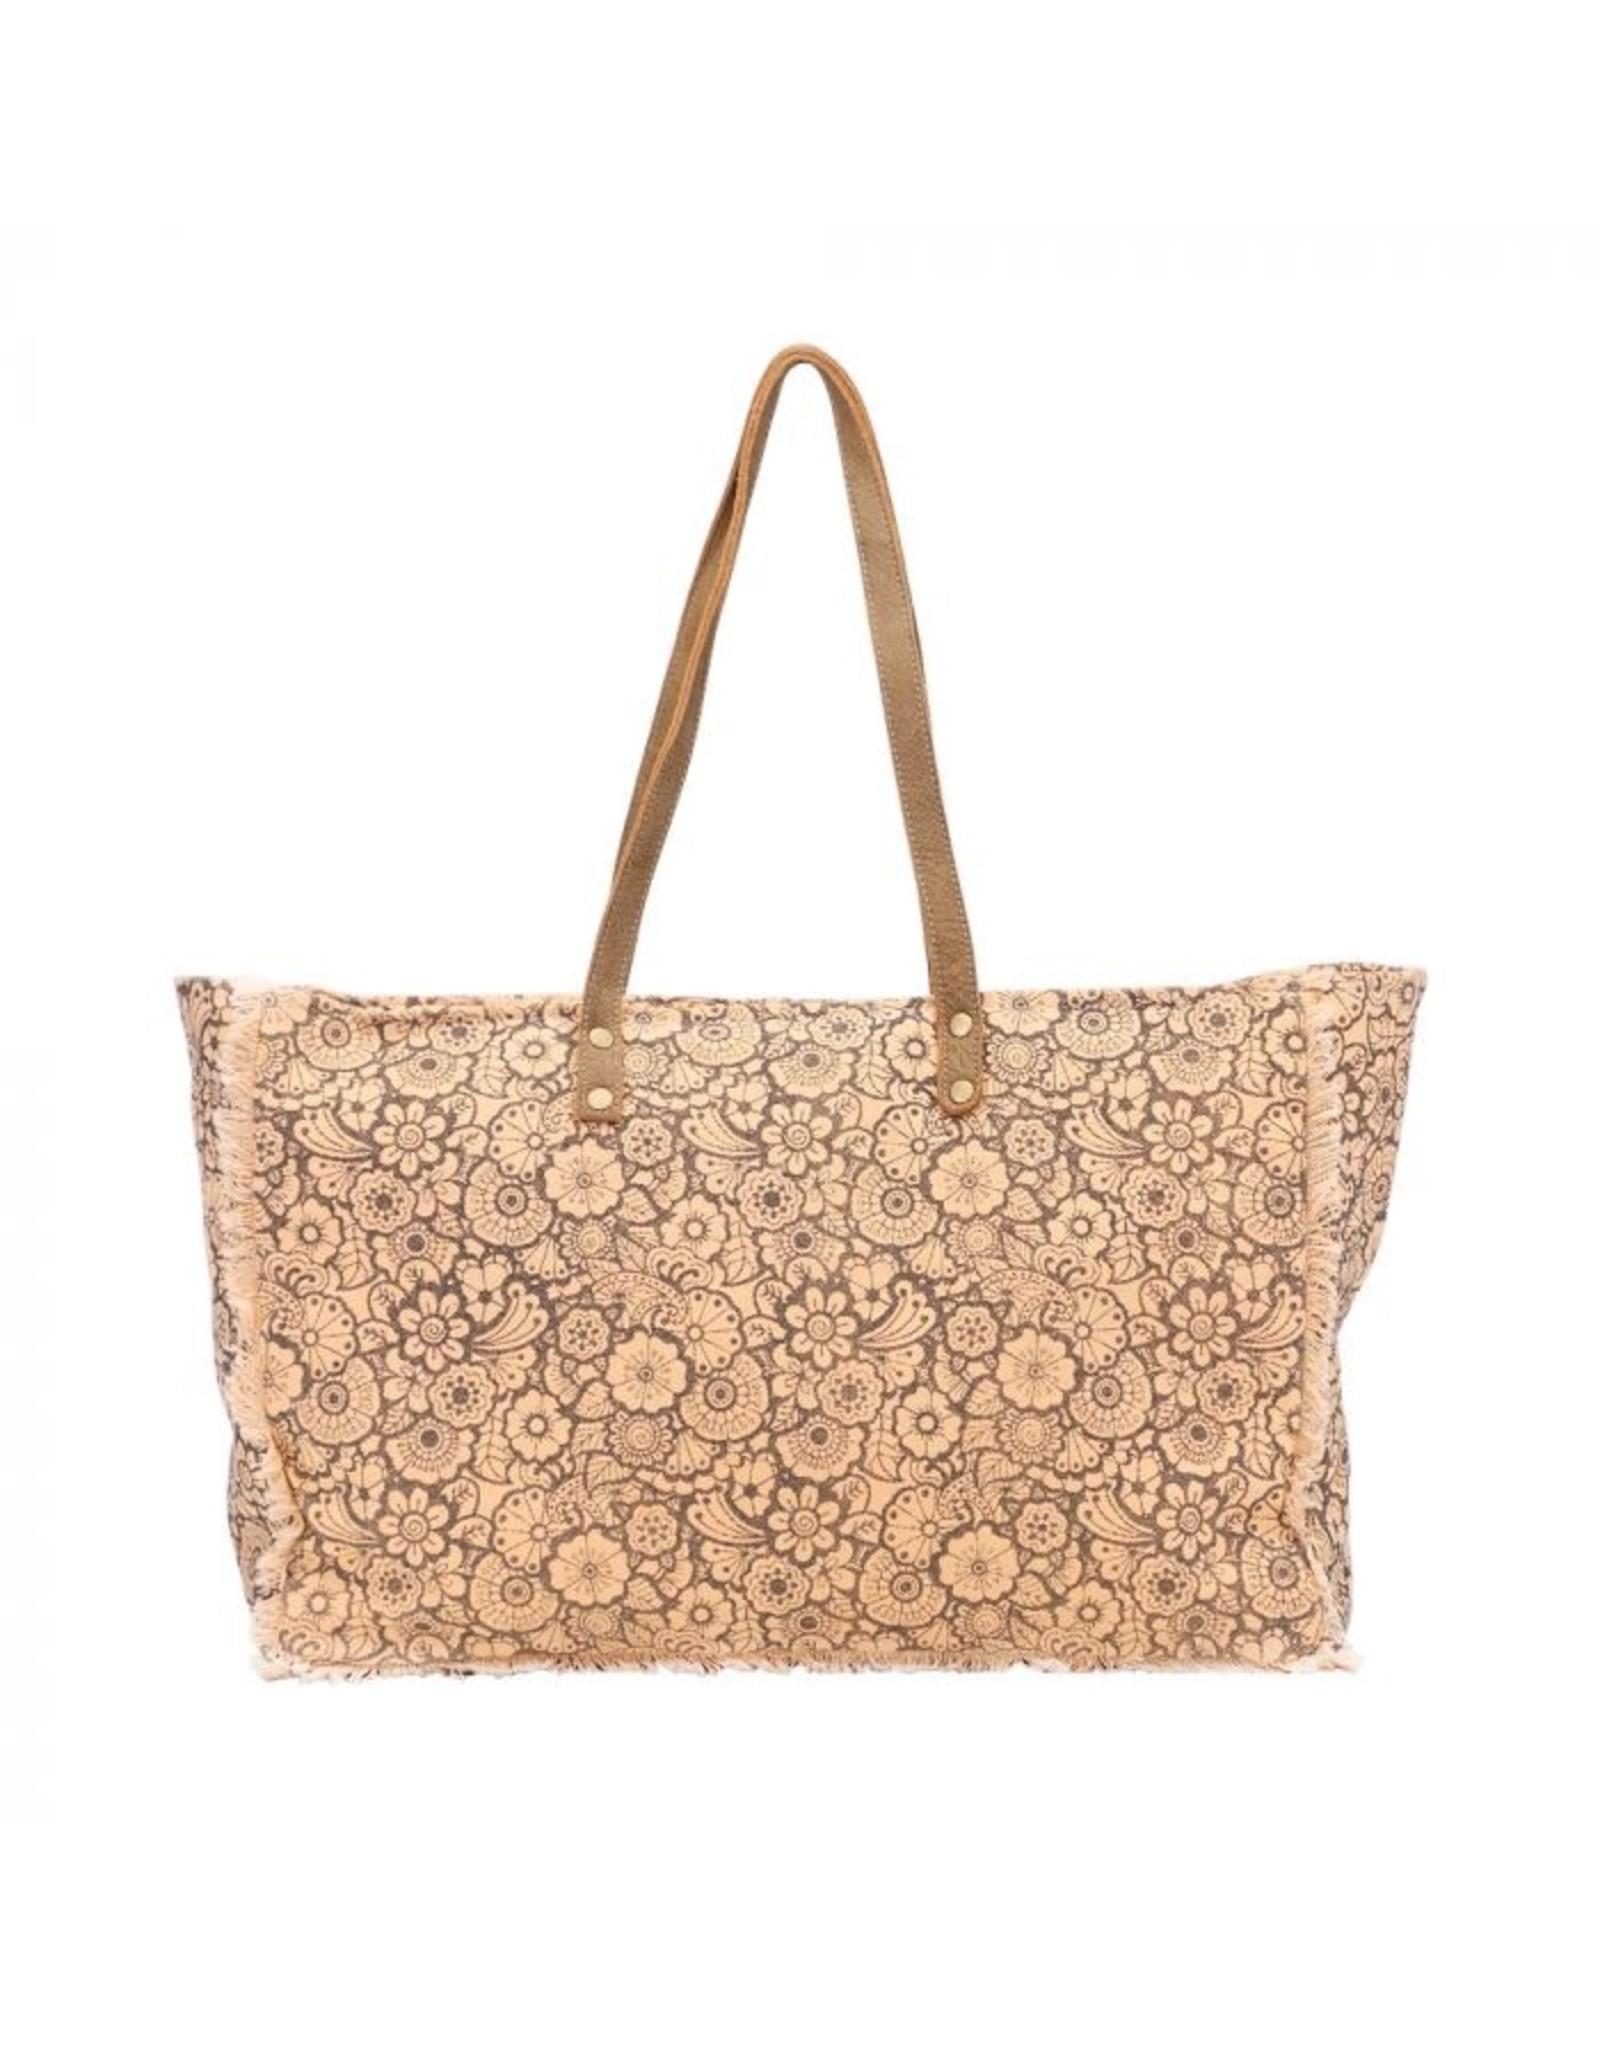 Myra Bag Perennial Weekender Bag